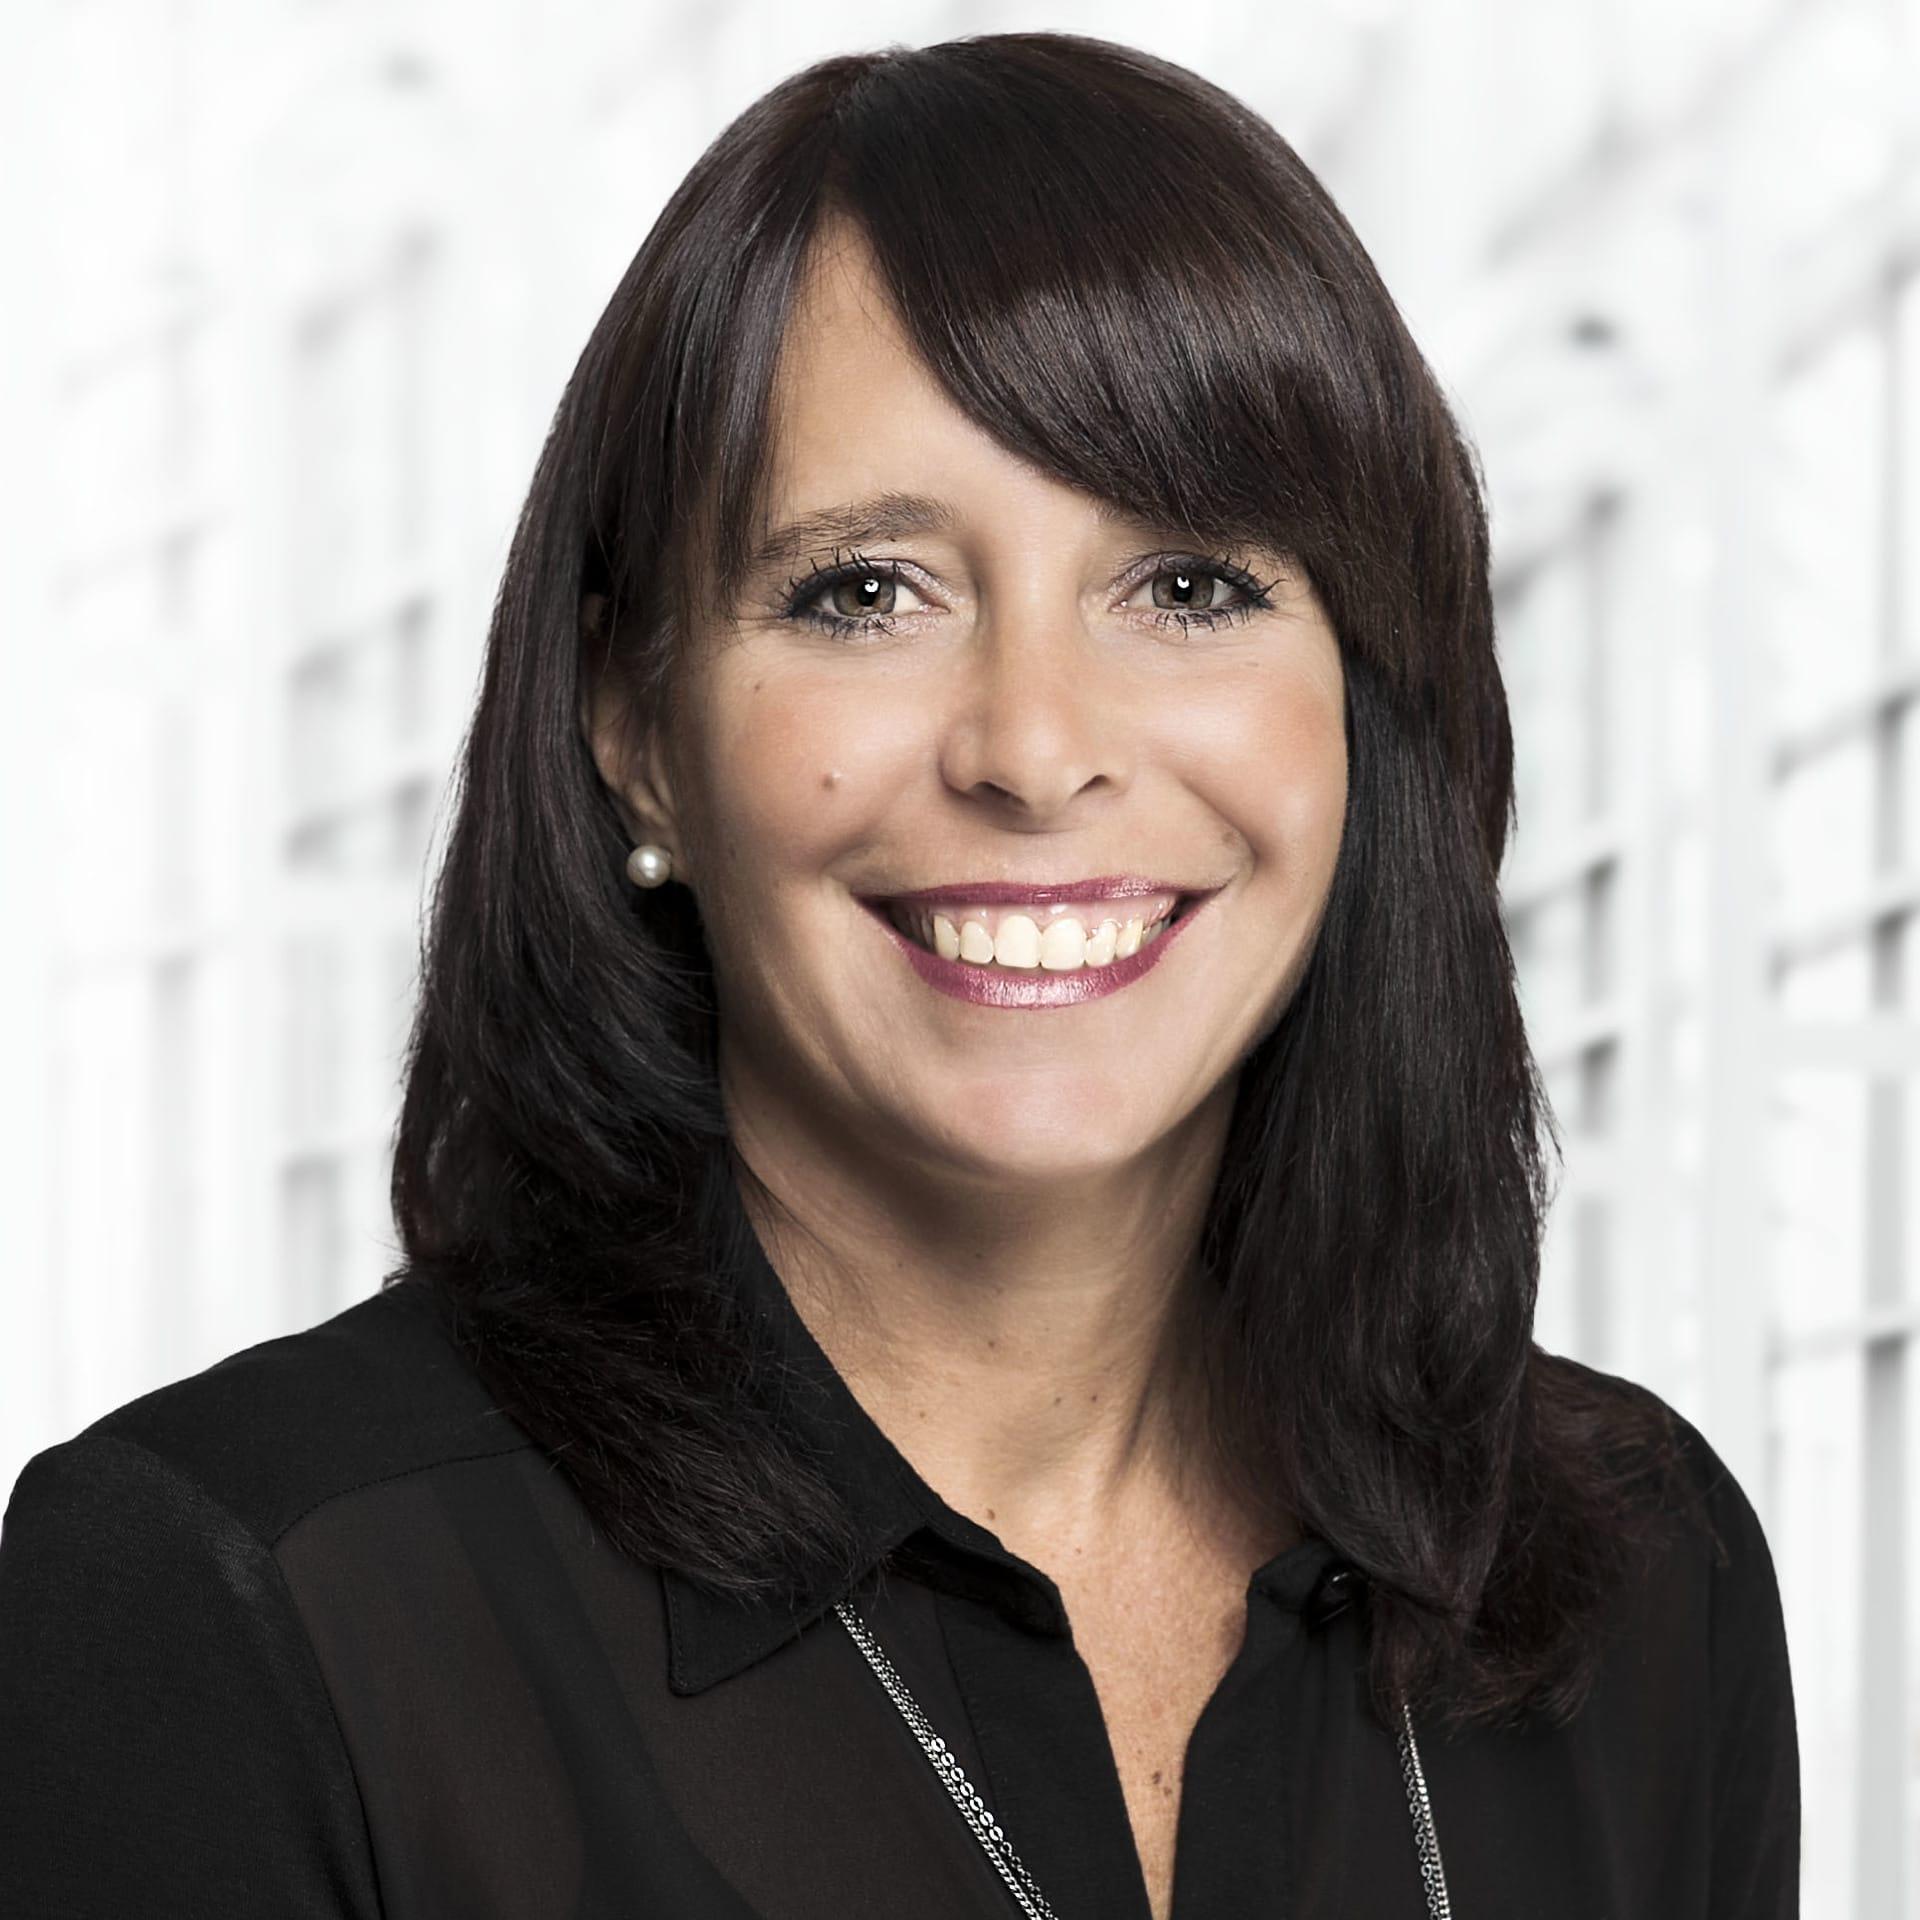 Julie Chaussé